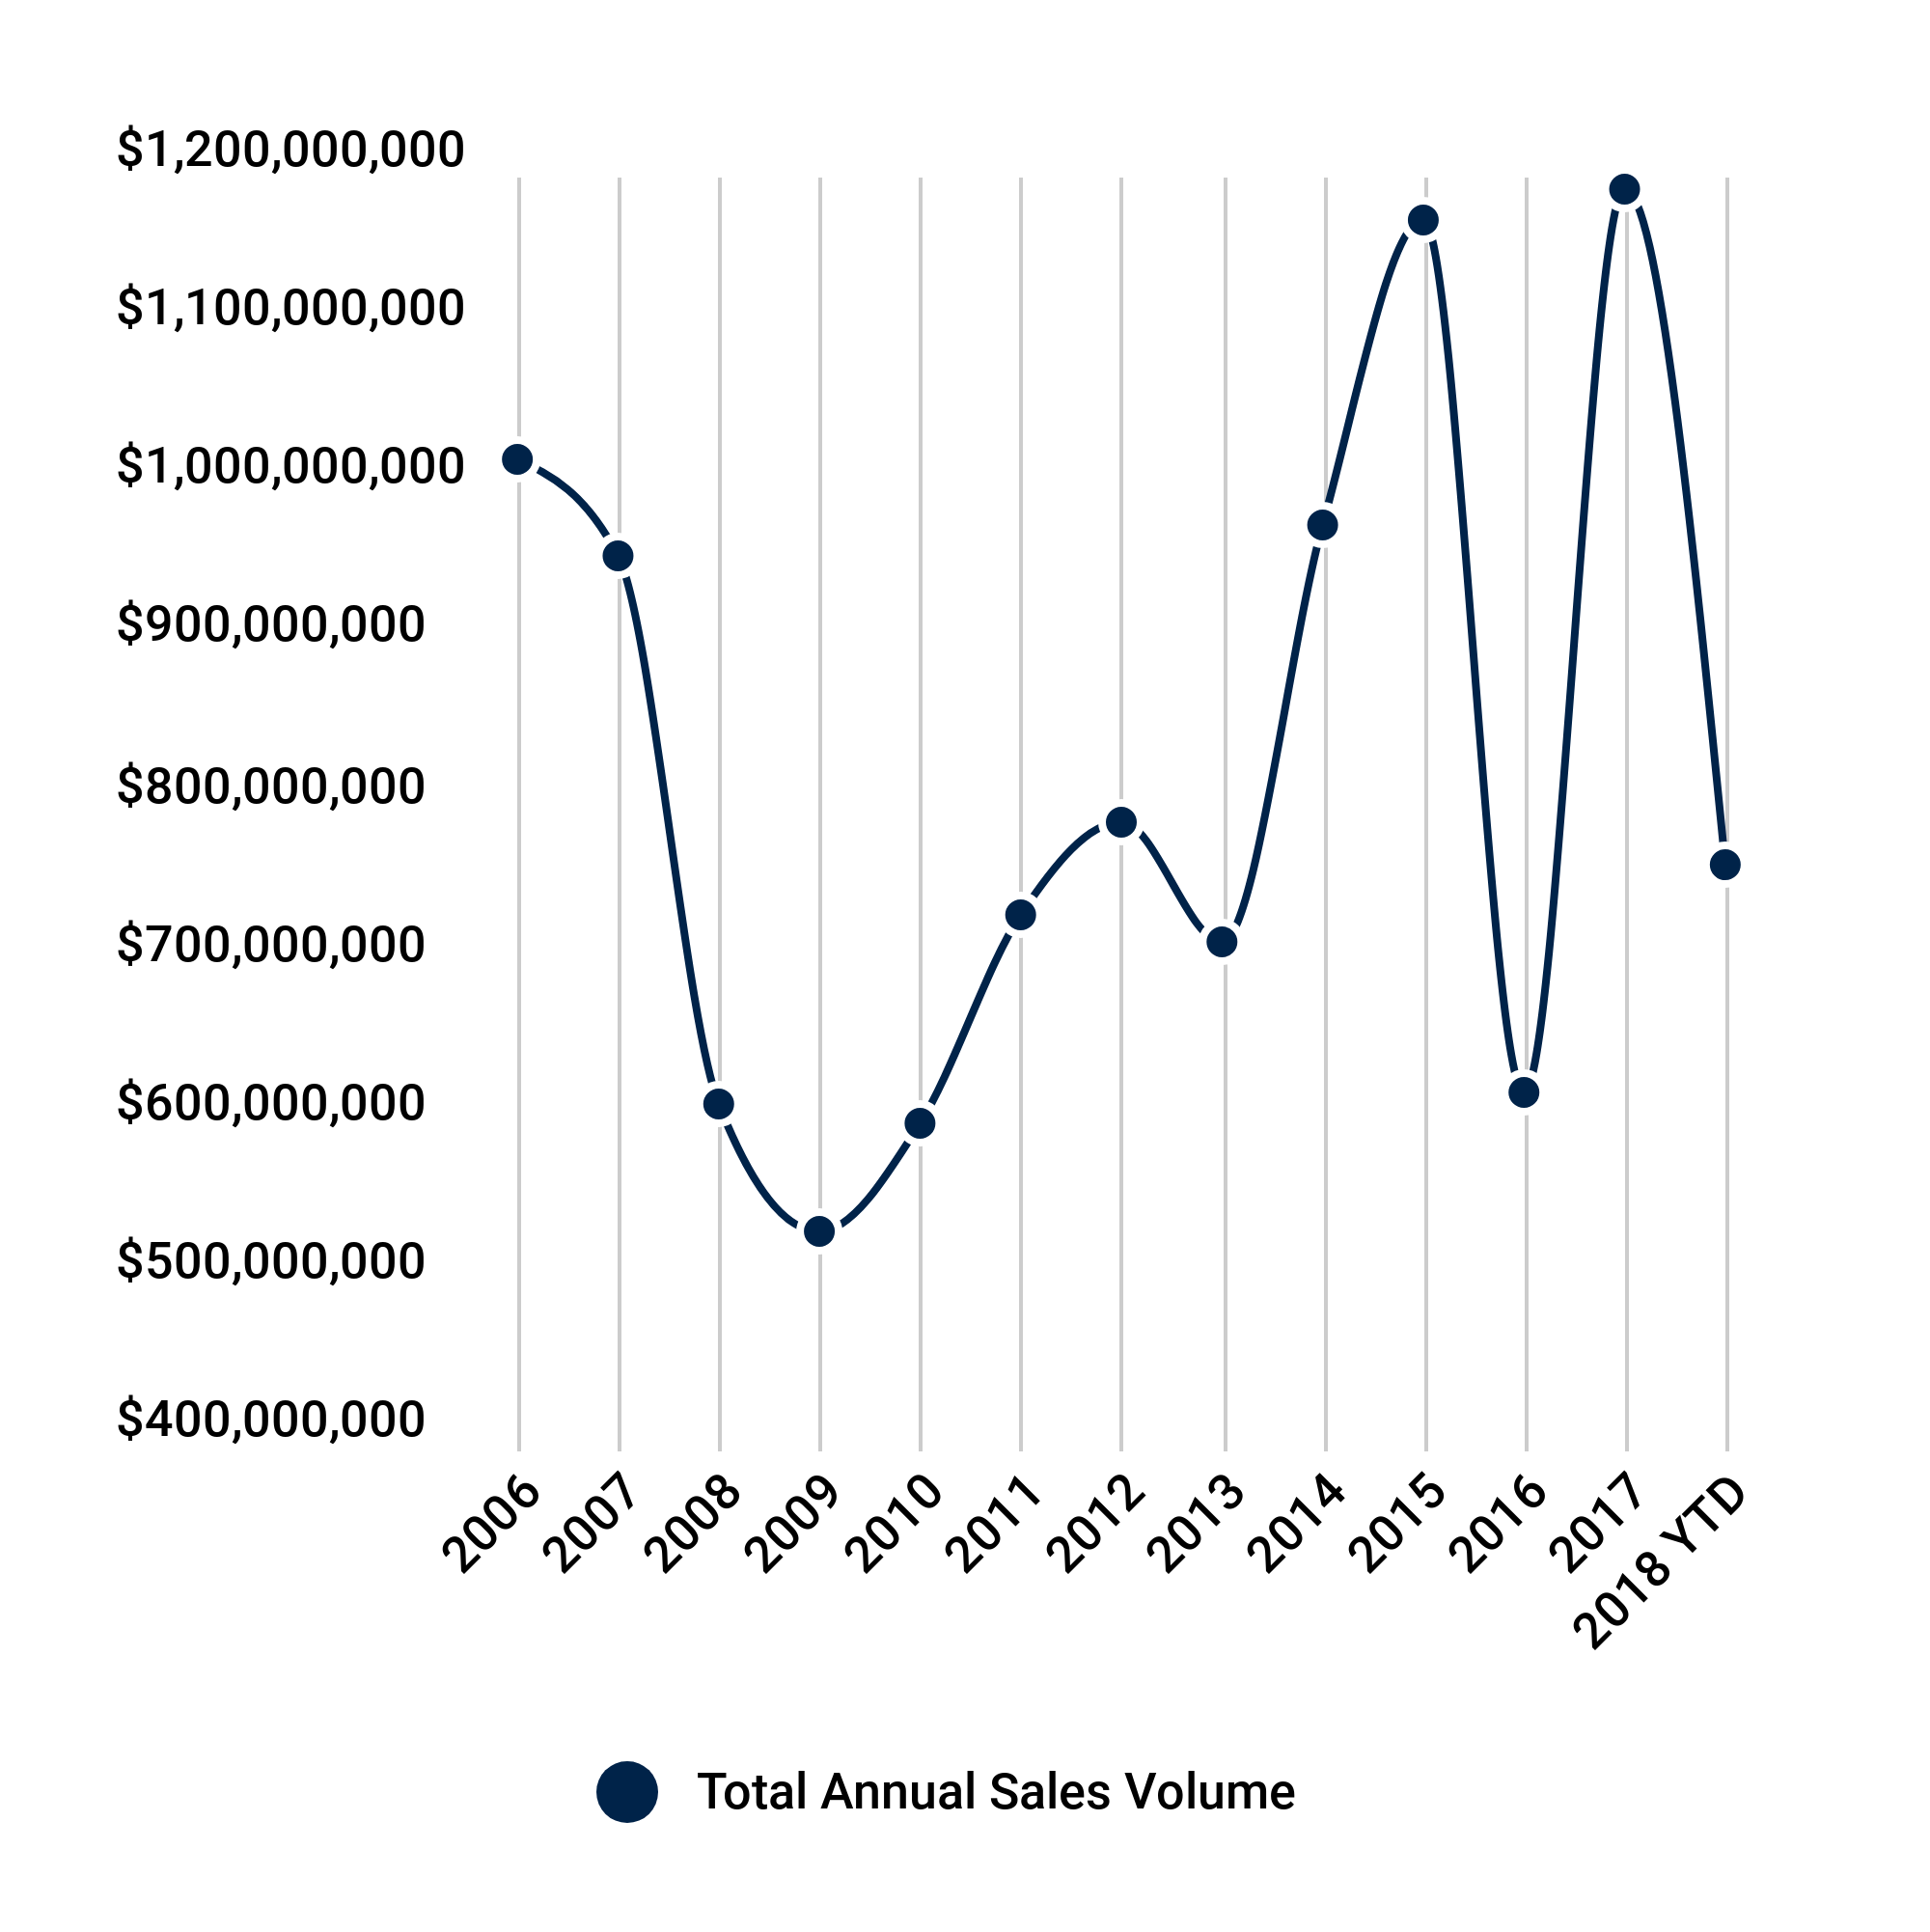 Total Annual Sales Volume